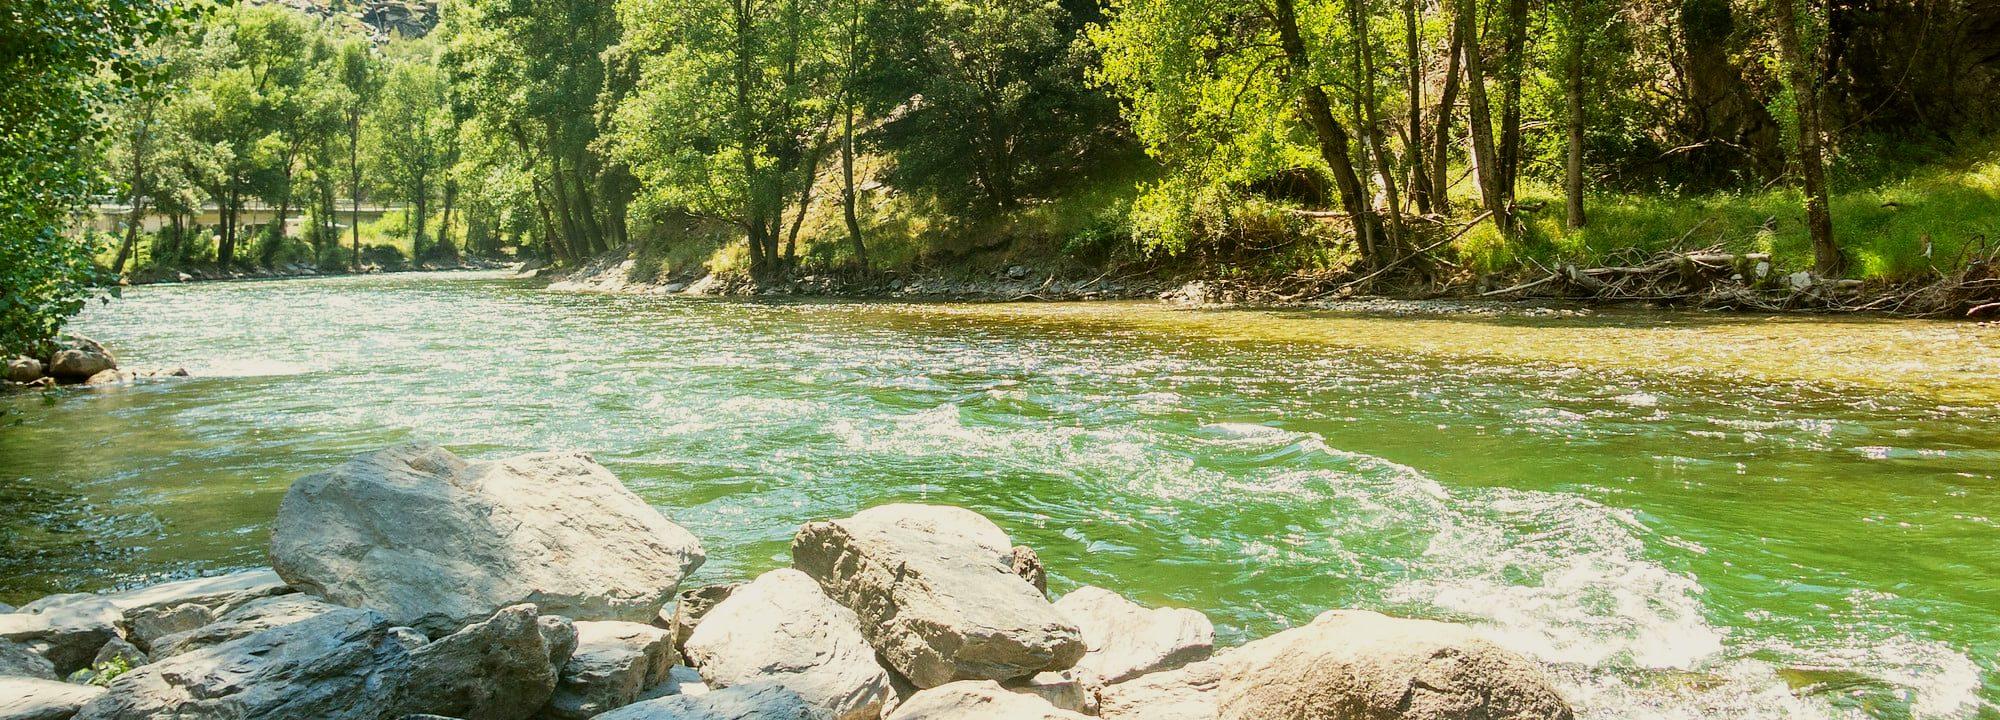 The Noguera Pallaresa and its strong rapids.